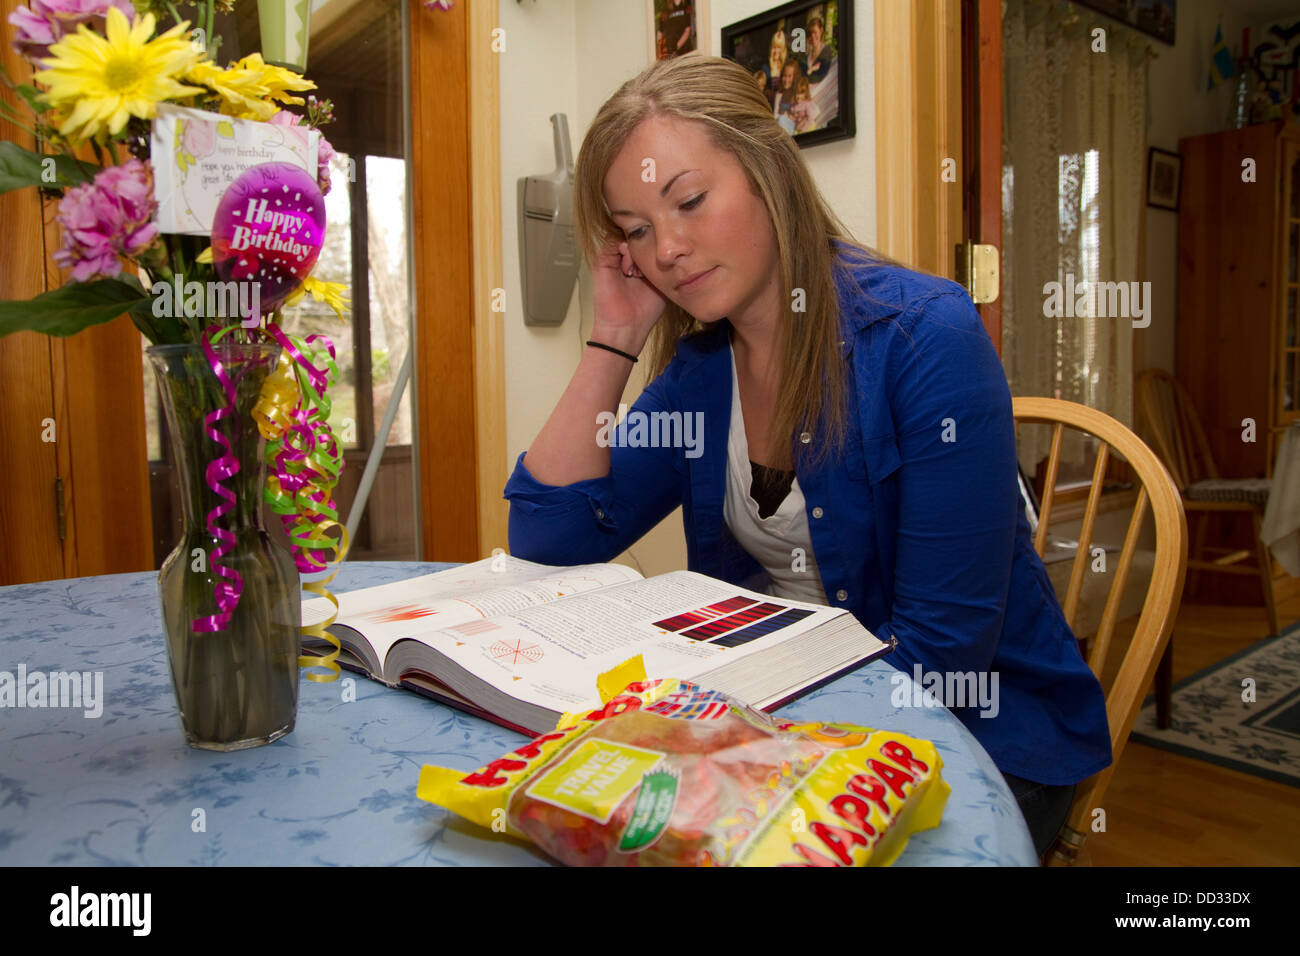 Young female student at kitchen table doing homework. Lindsborg, Kansas. - Stock Image